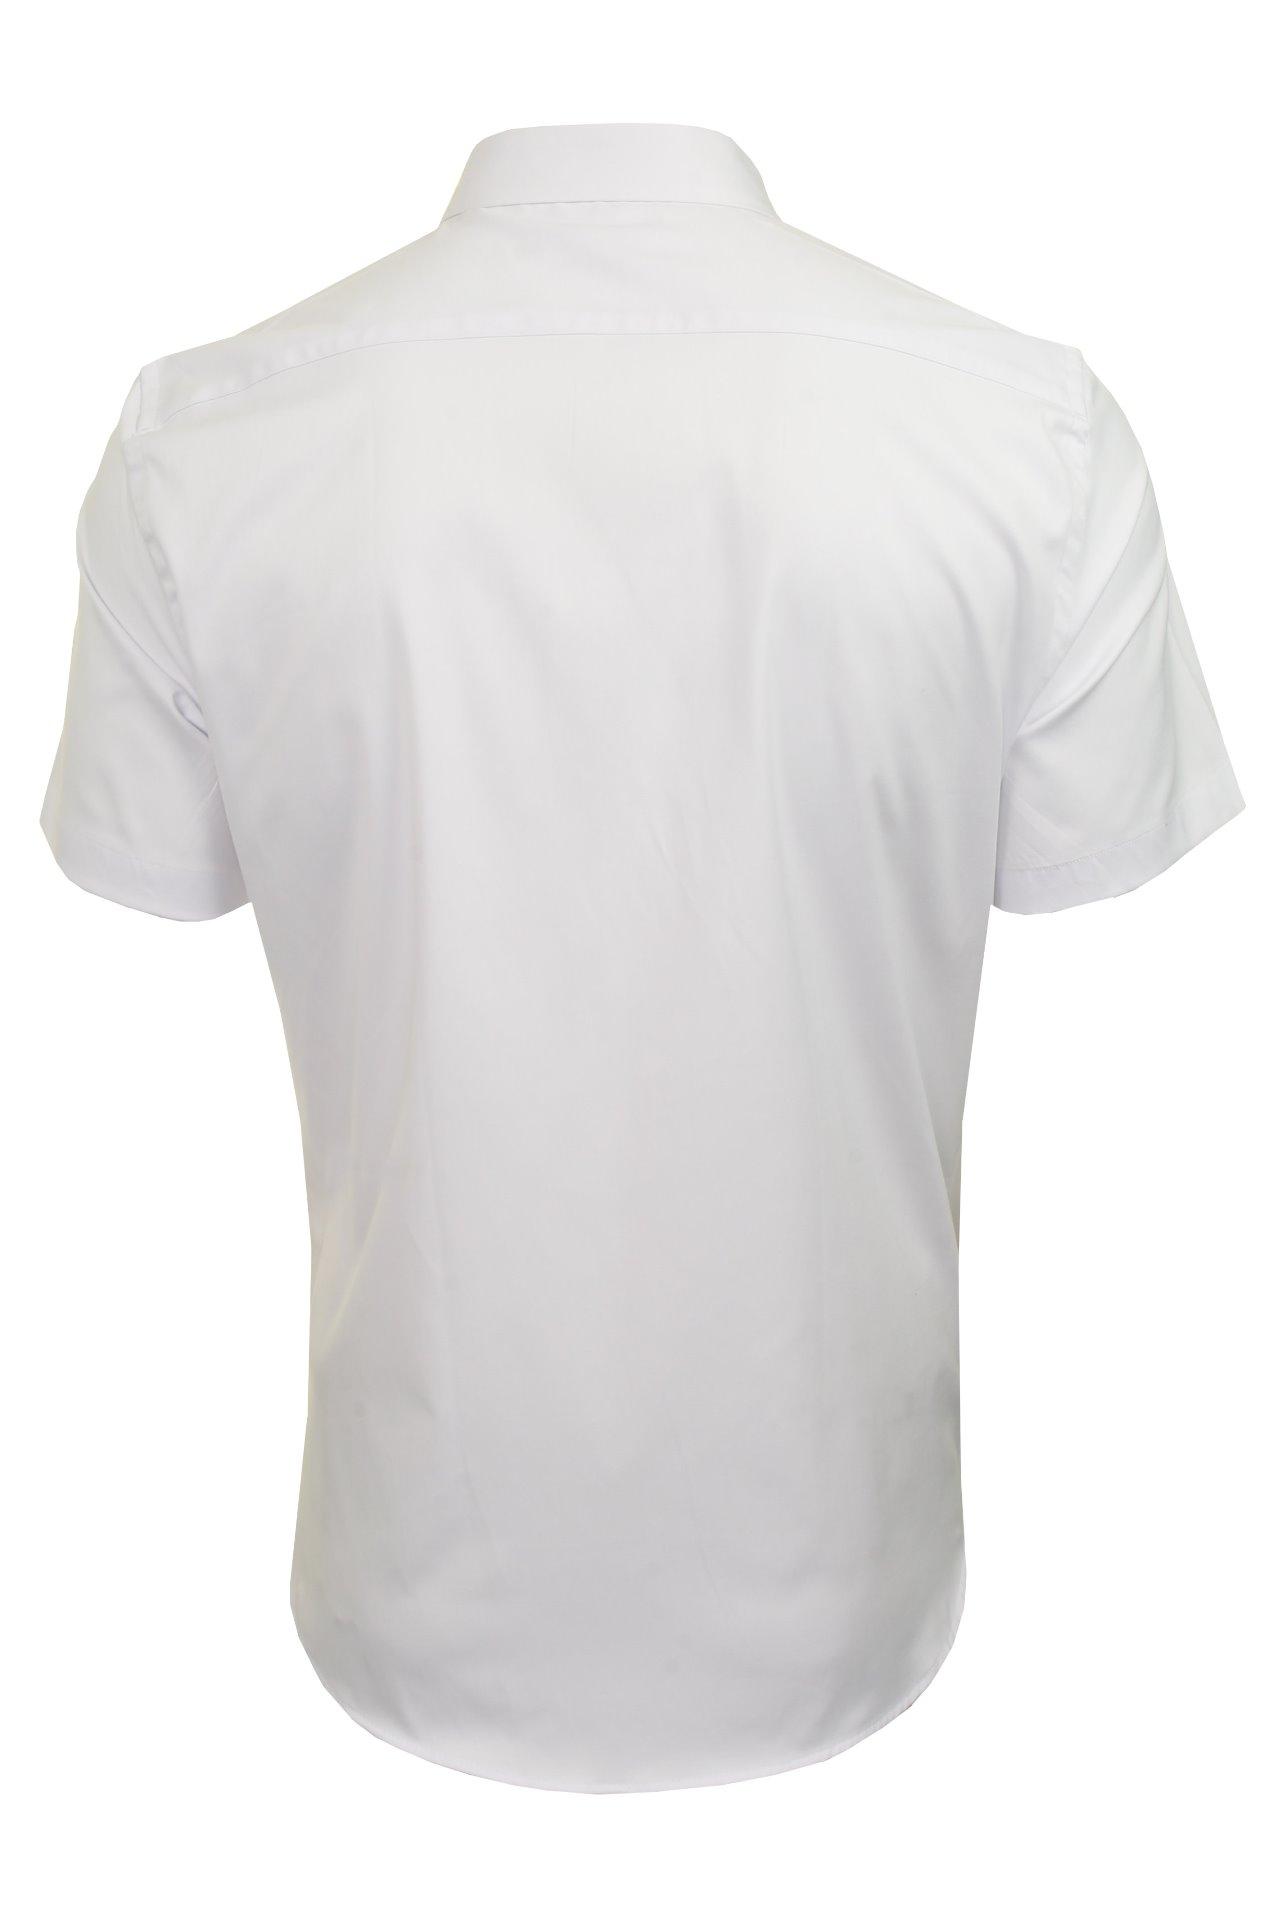 Xact-para-Hombre-de-Manga-Corta-Camisa-Slim-Fit-Popelin-del-estiramiento miniatura 13